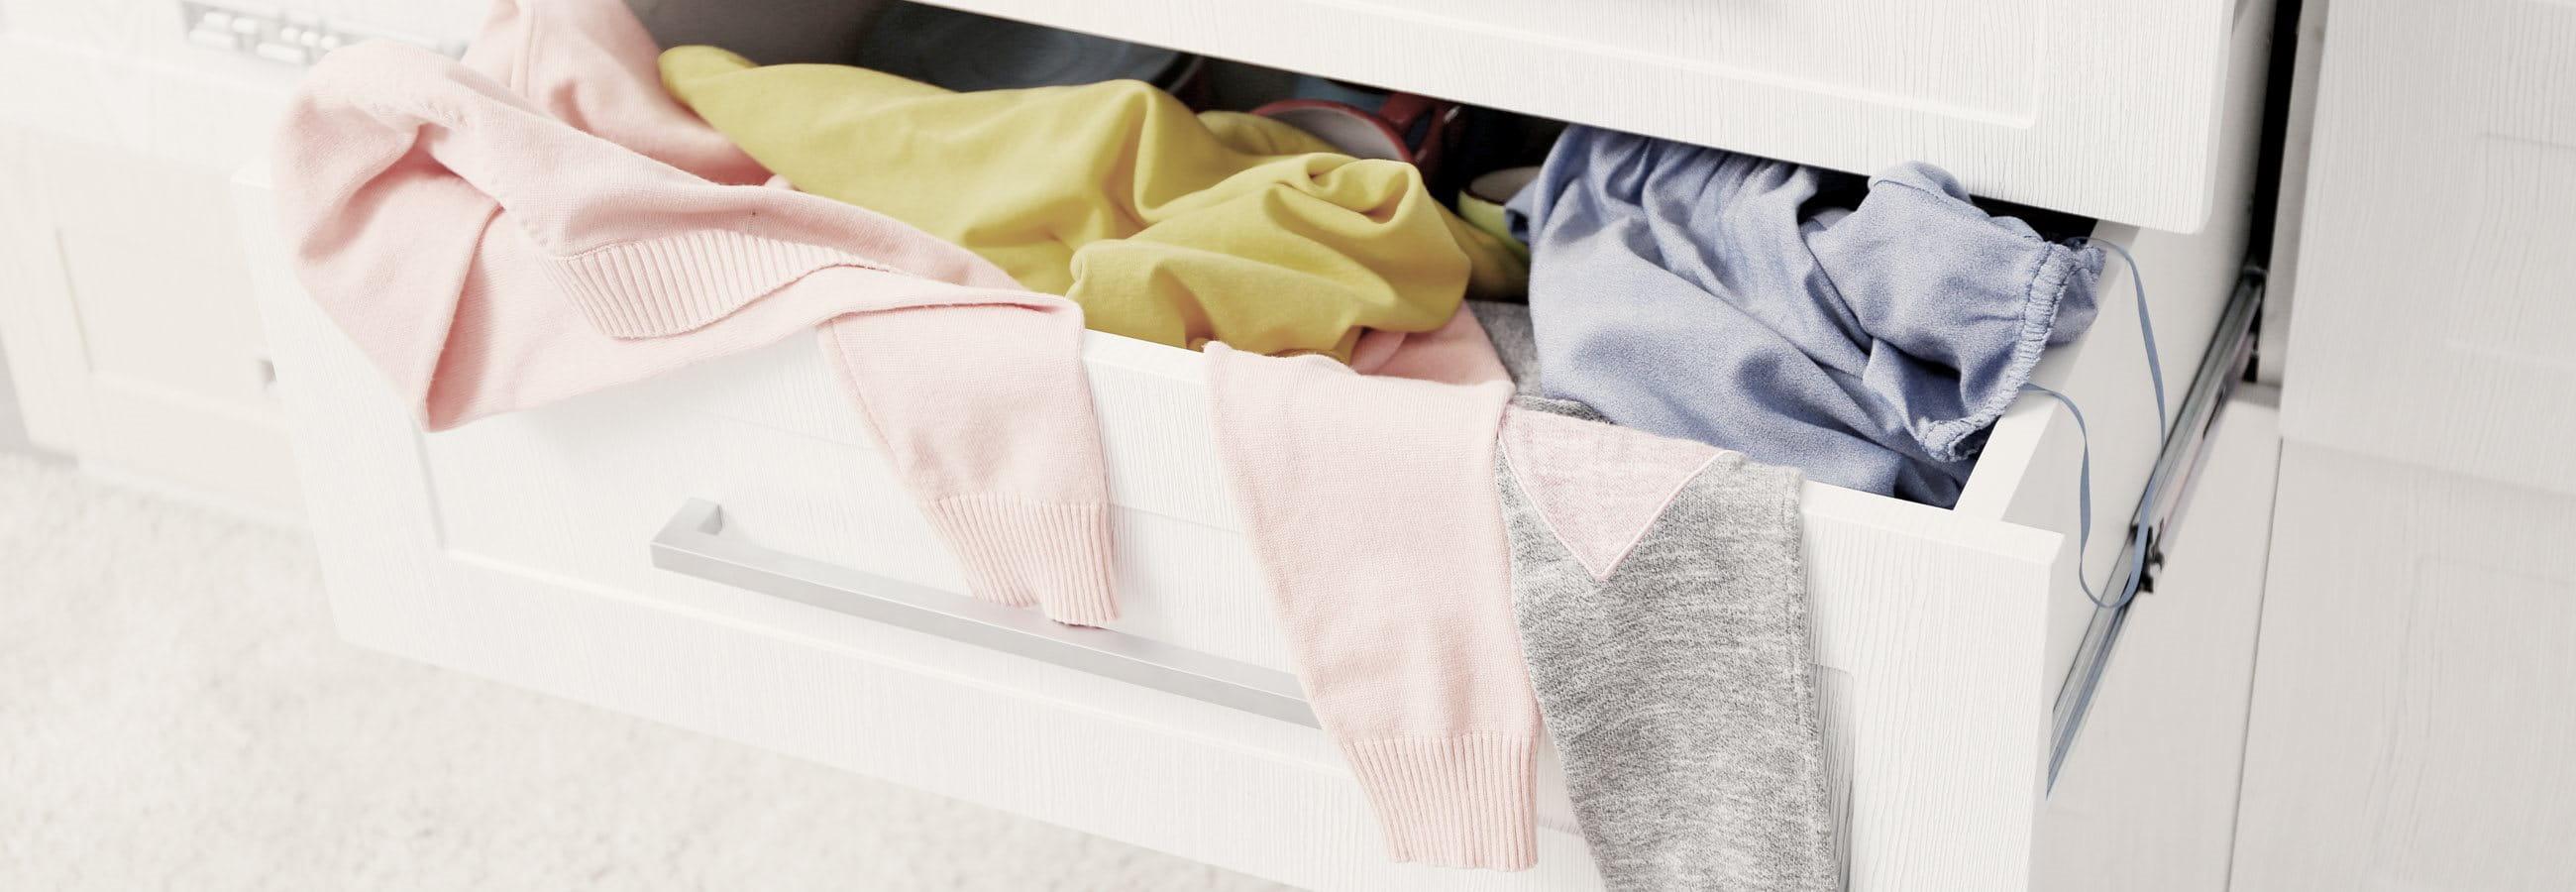 Ransacked drawer